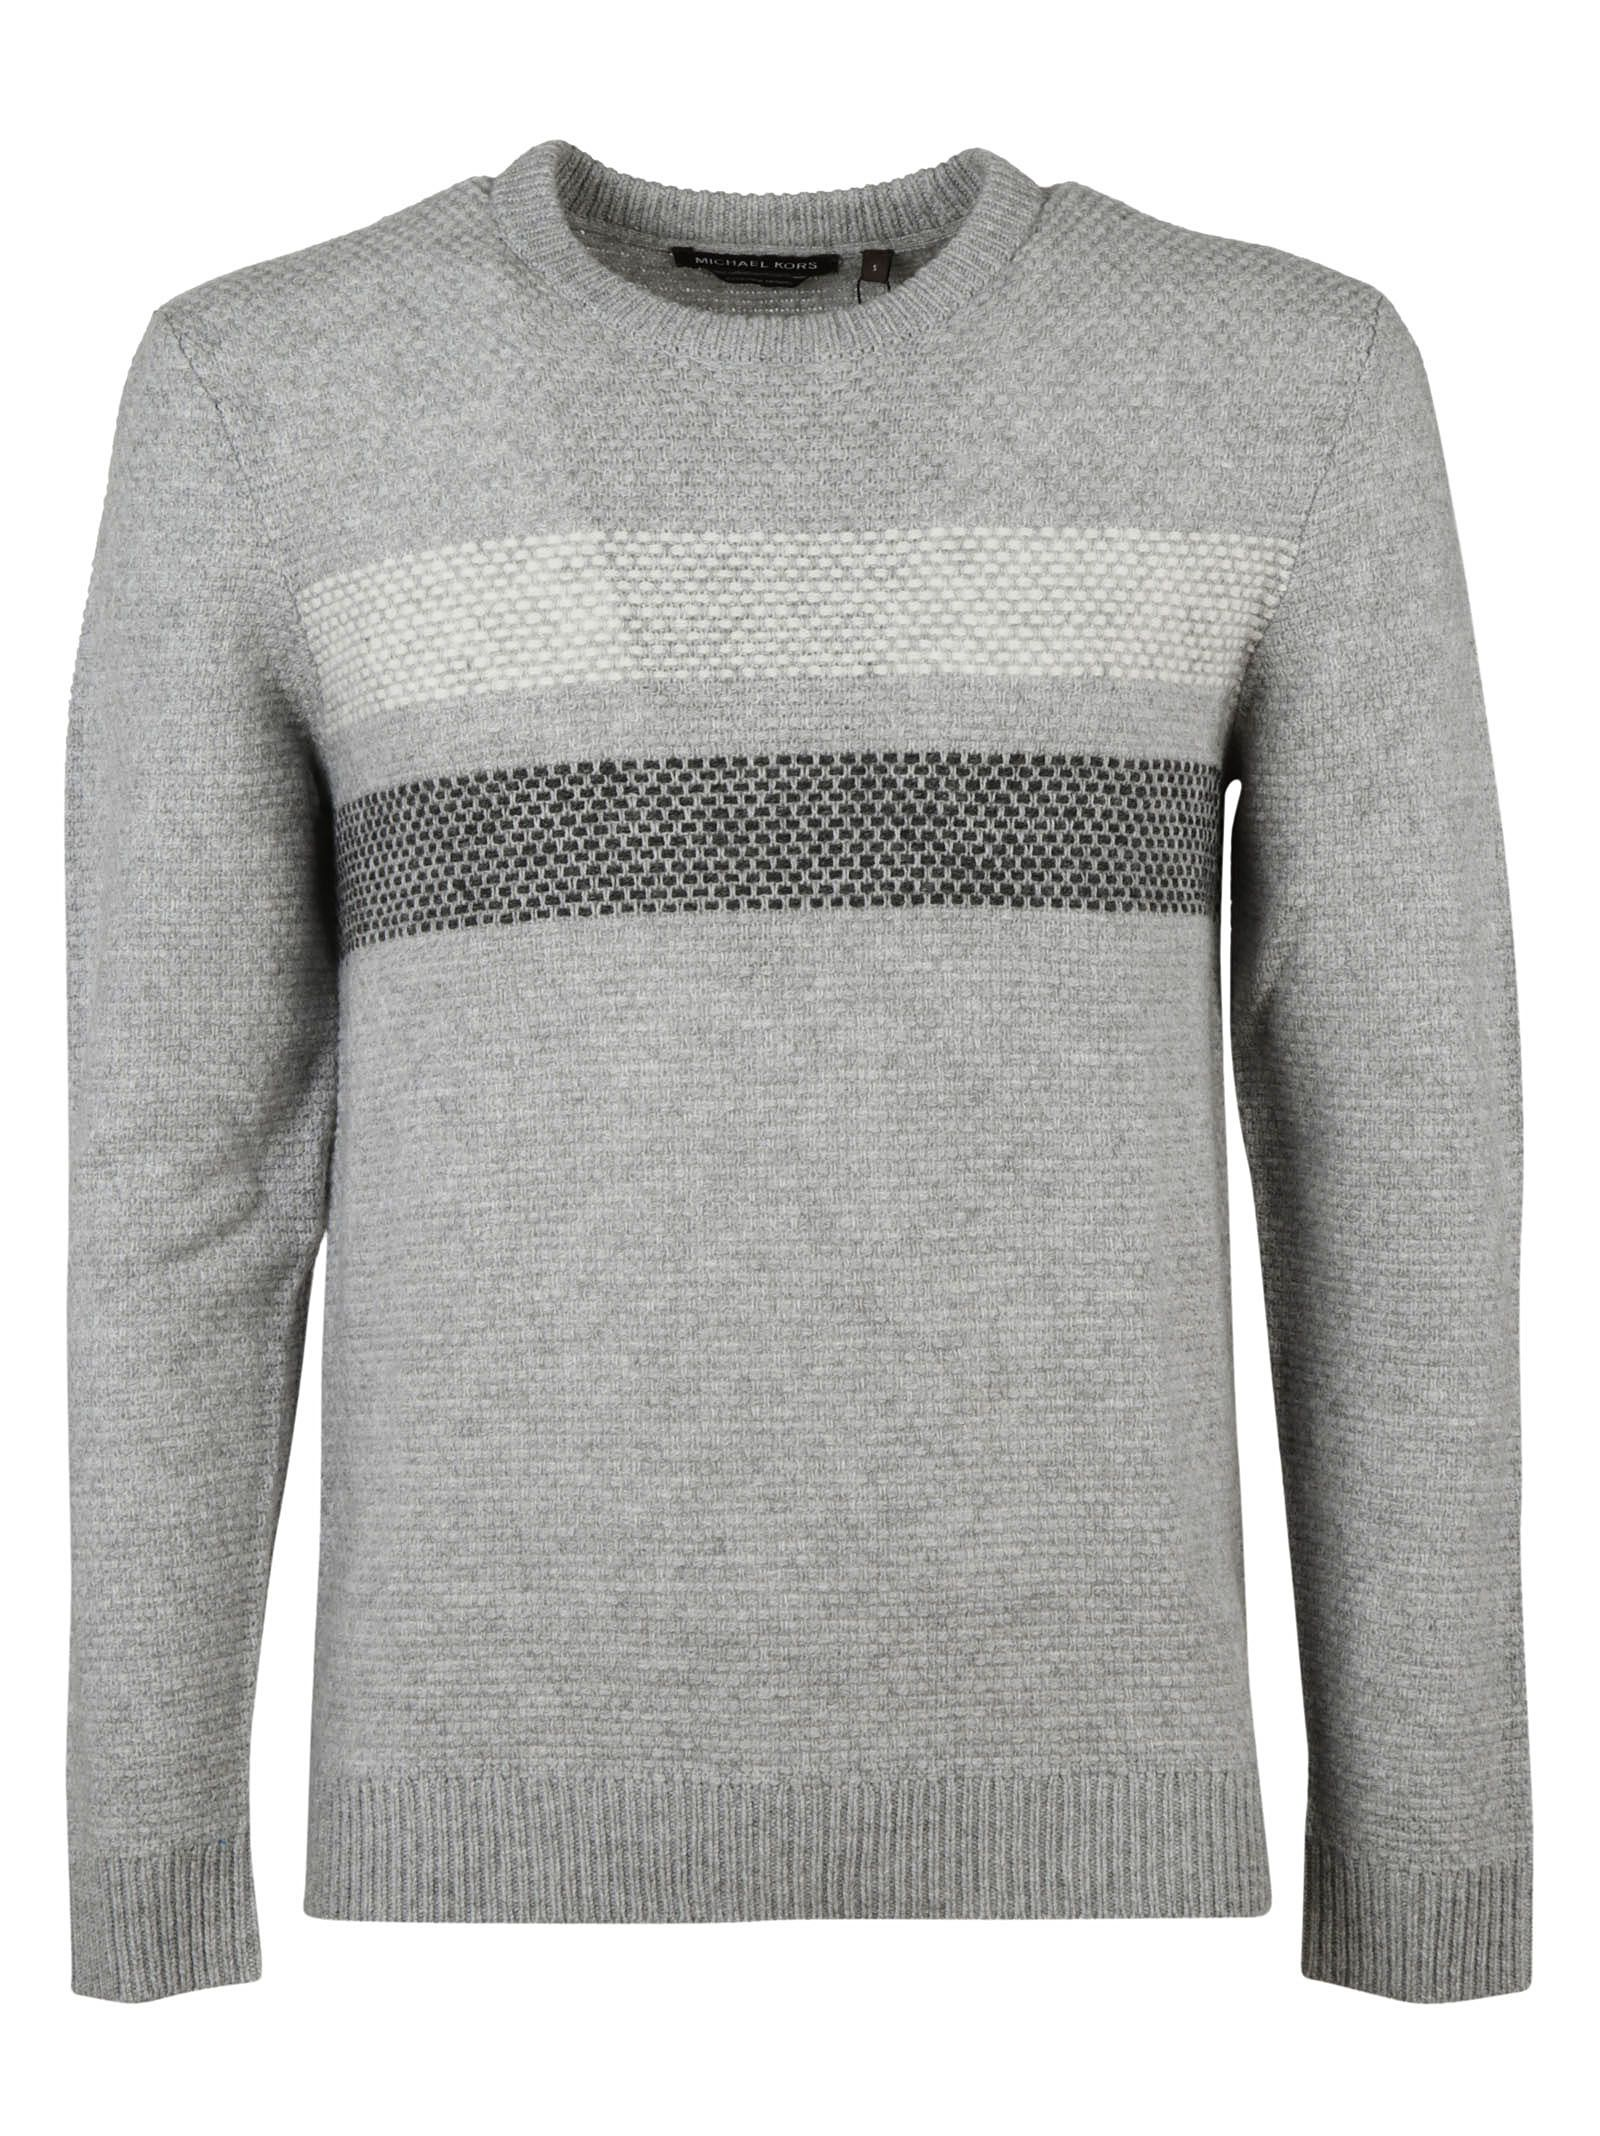 Michael Kors Ribbed Sweater